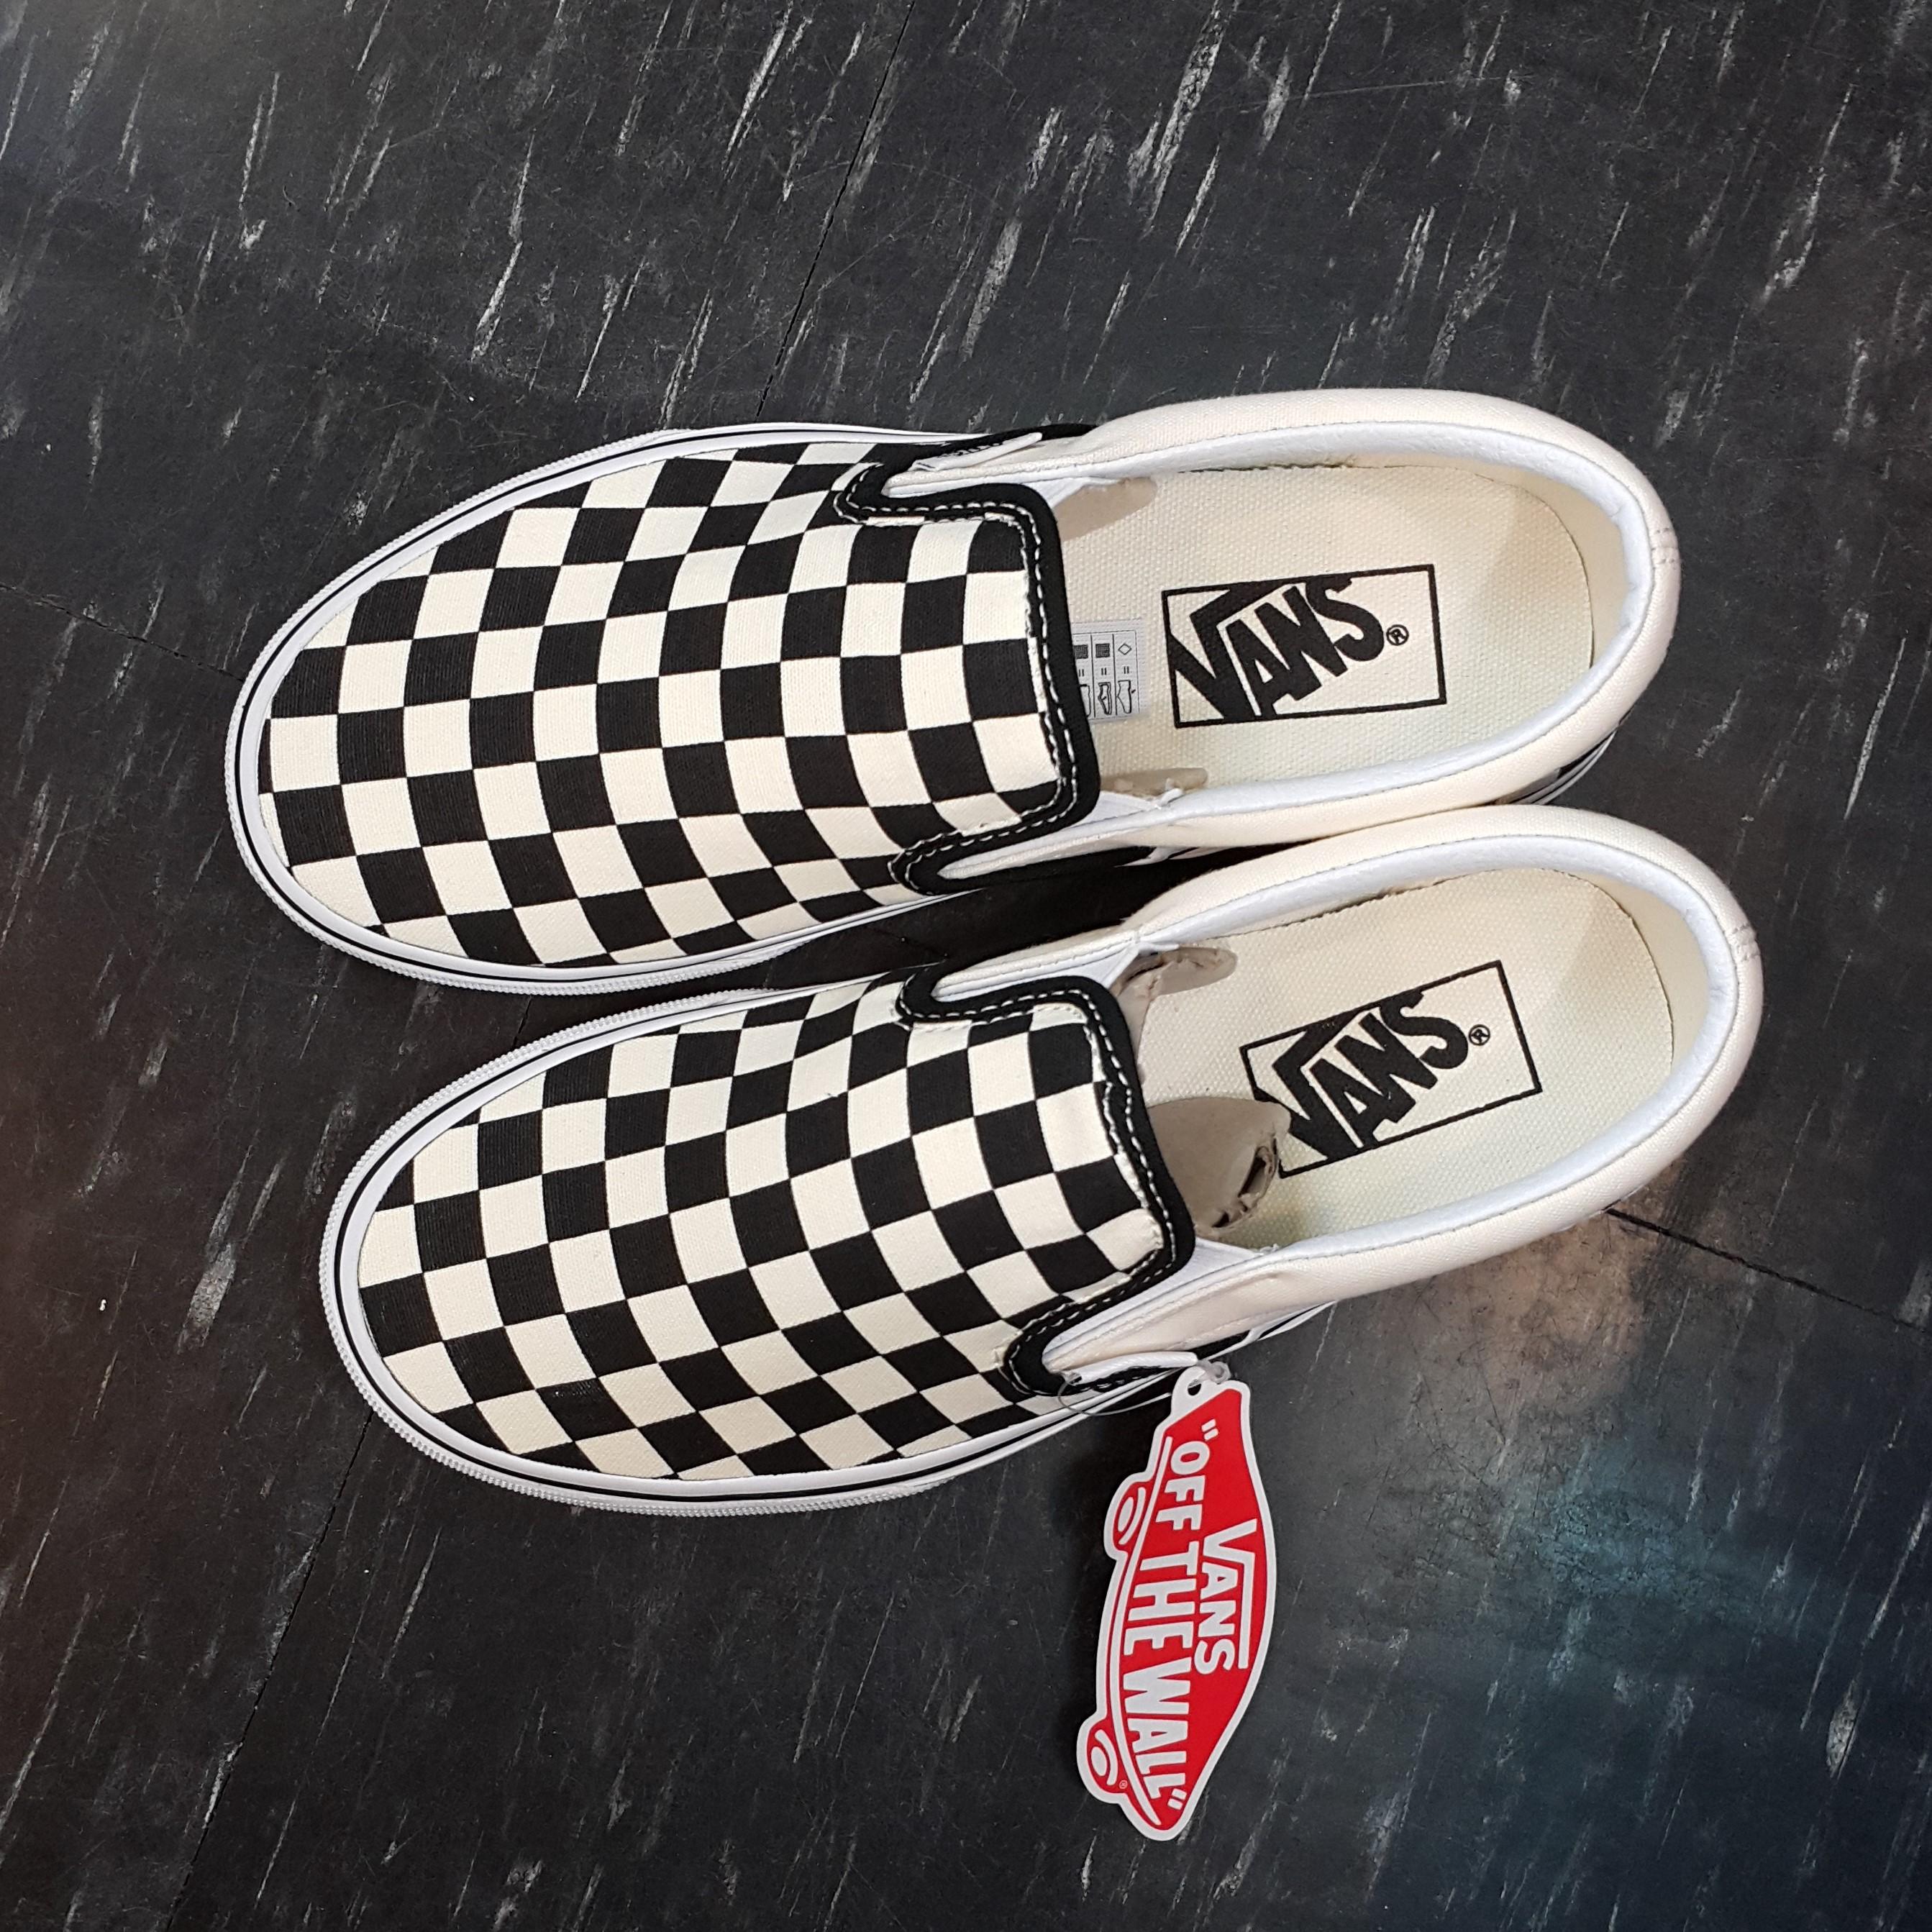 VANS Slip On 棋盤格 懶人鞋 黑白 黑色 白色 黑白格 基本款 經典款 帆布 板鞋 VN000EYEBWW